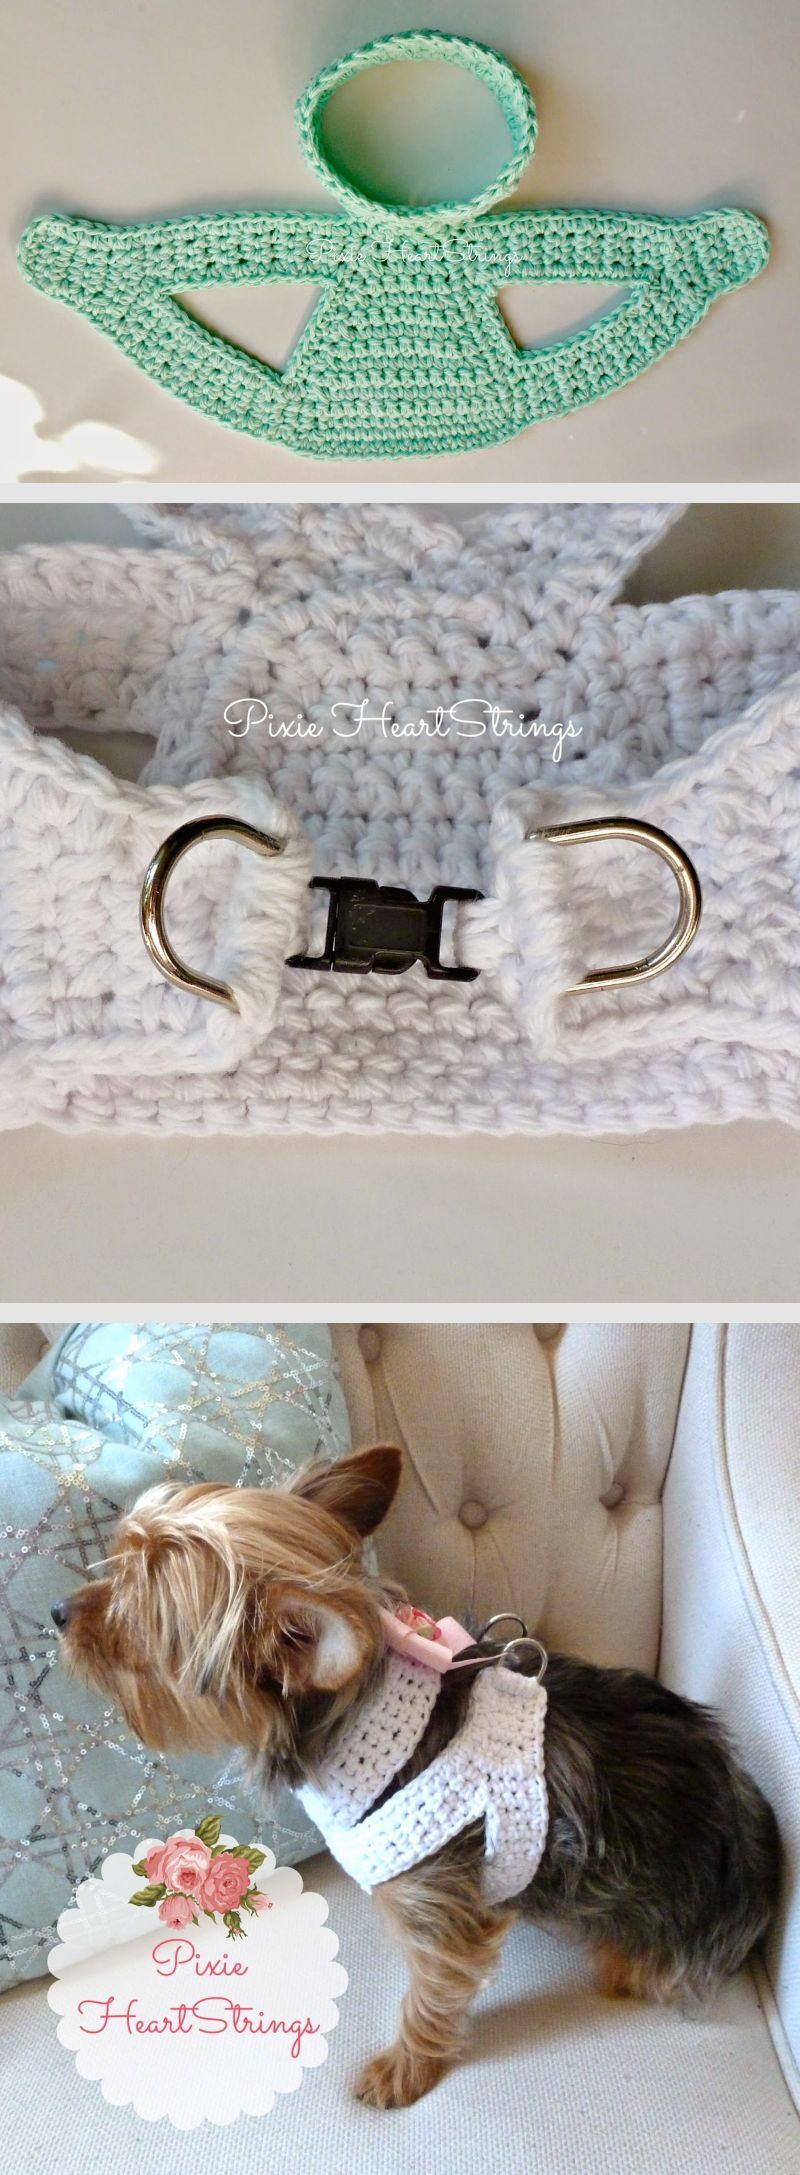 31 Days of Sewing | Mascotas, Tejido y Ganchillo